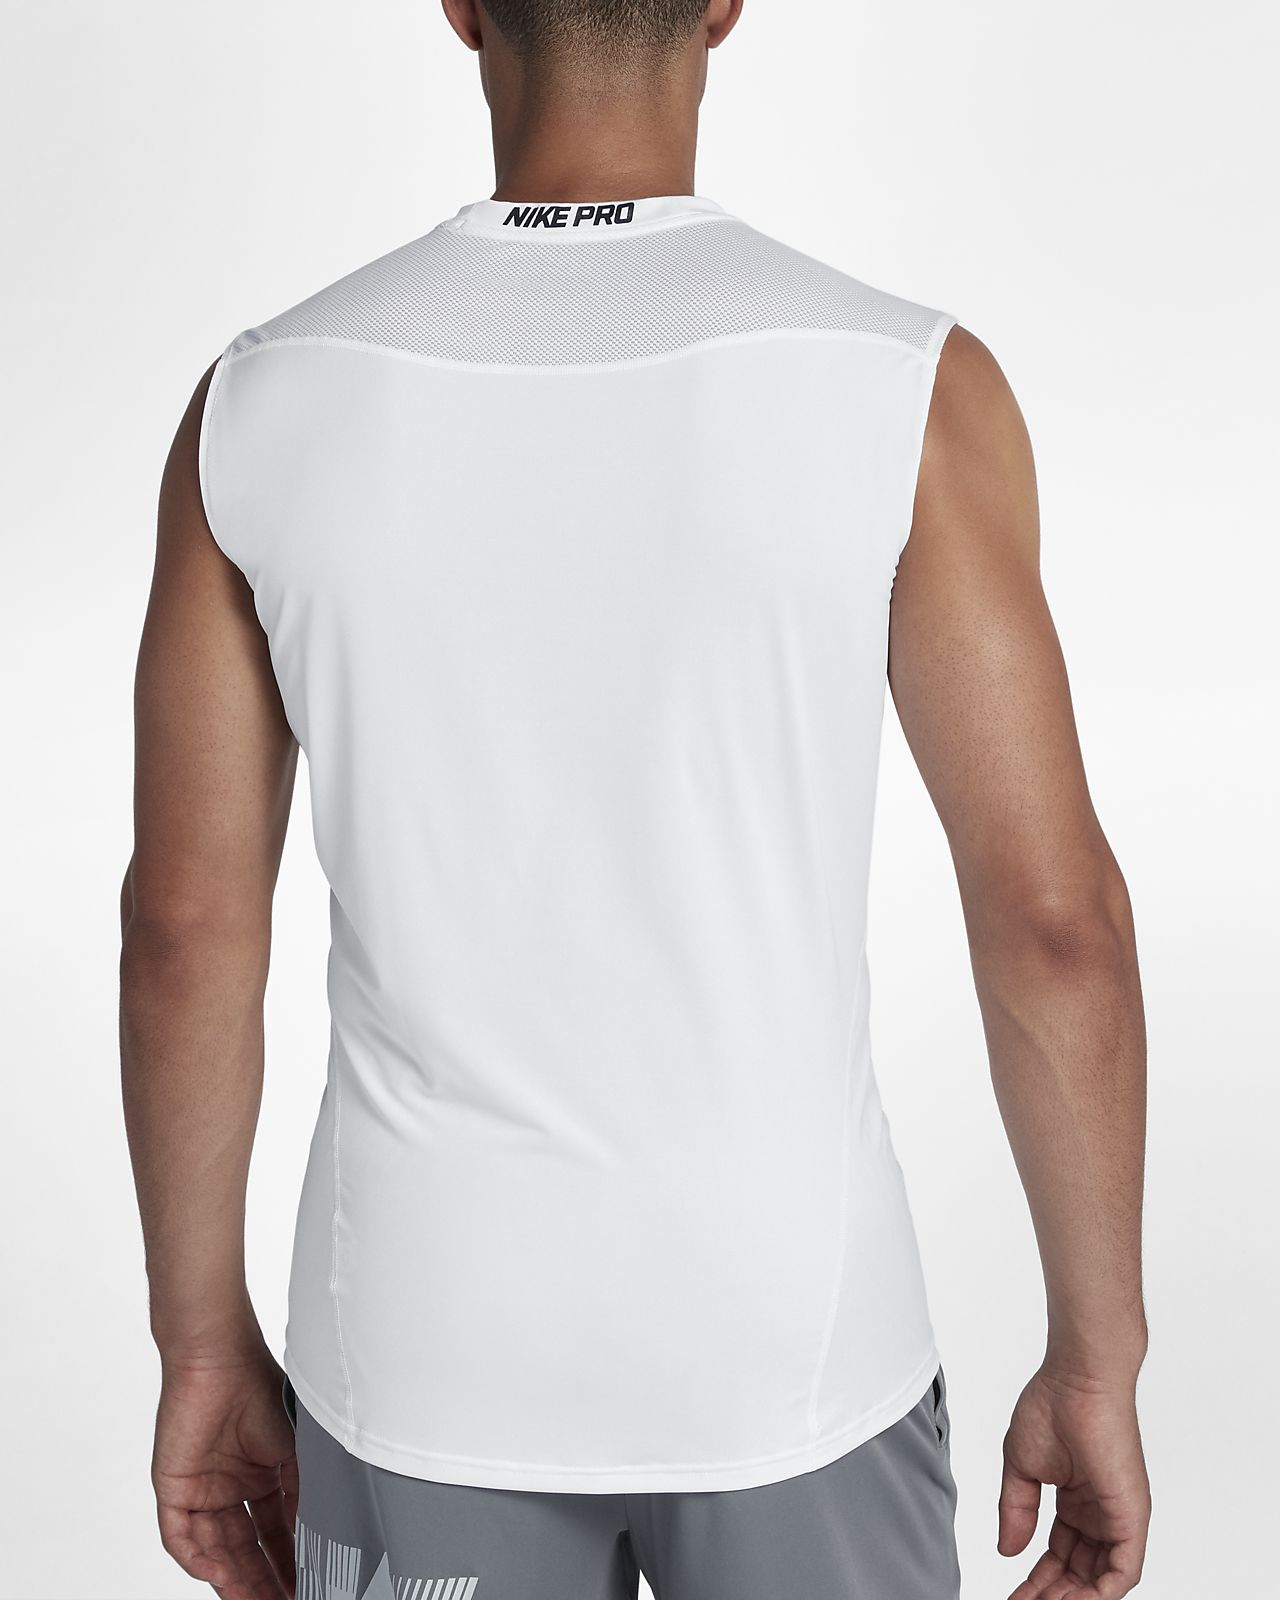 Nike Training Pro Compression Vest SL Black Men/'s Athletic Top 2018-838085-010